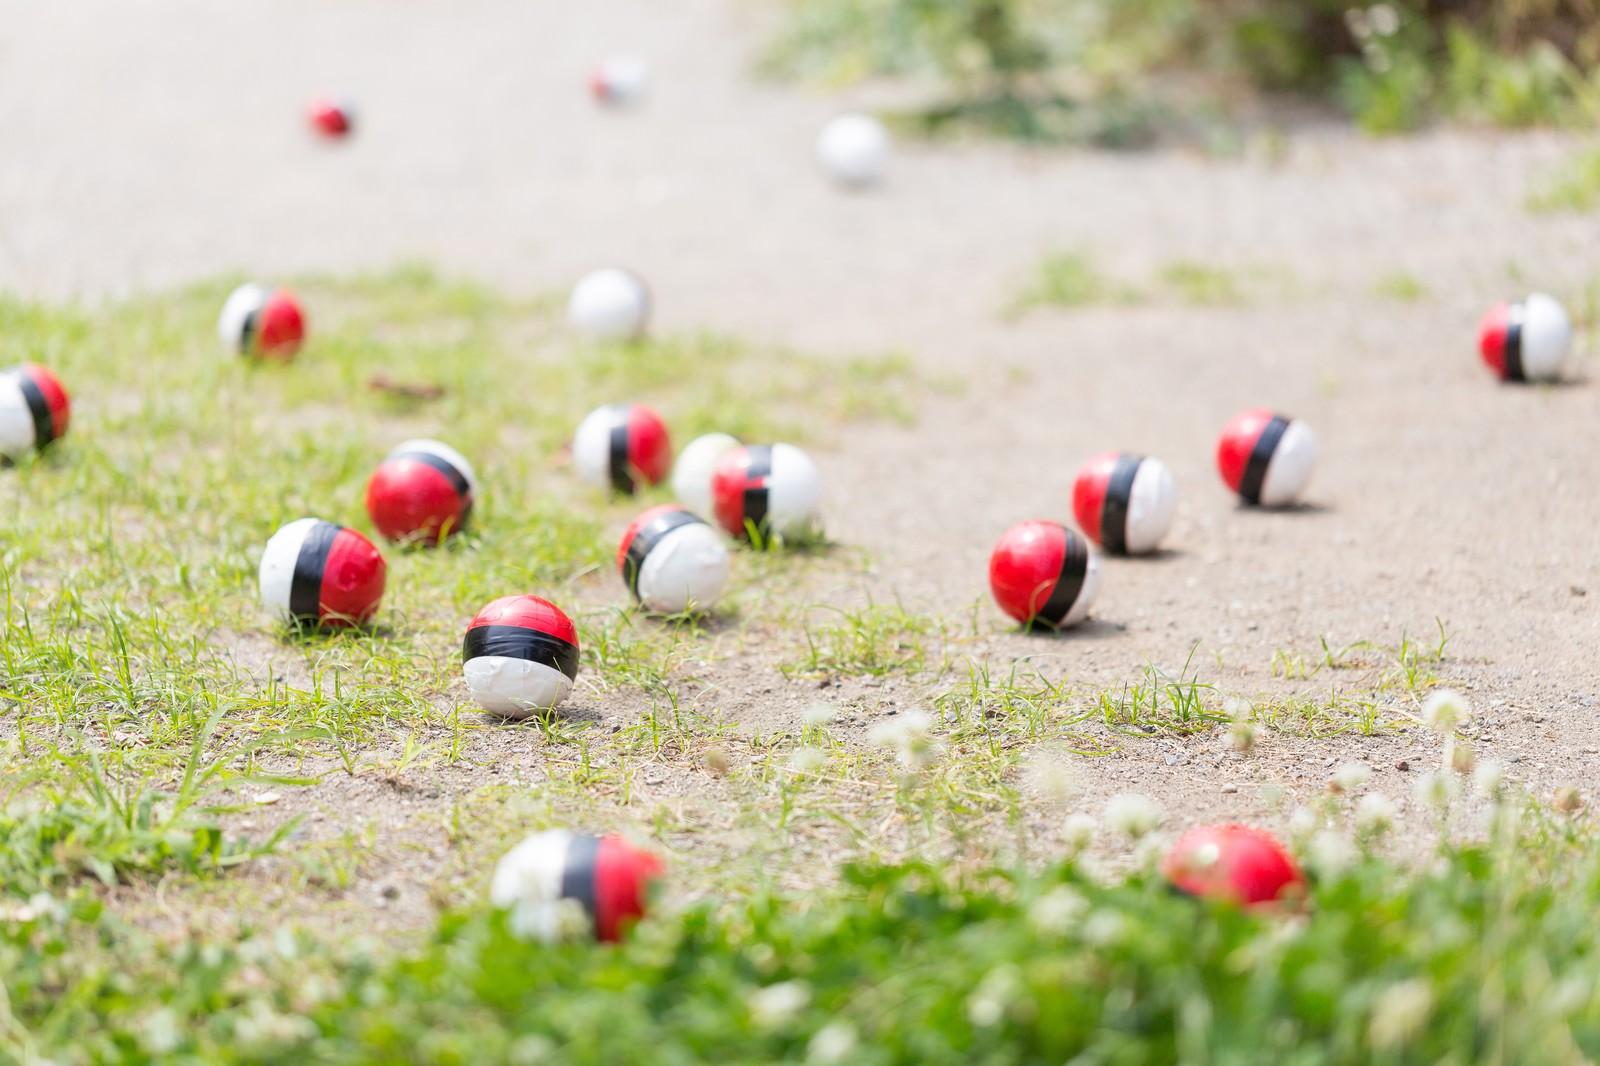 「SNSで拡散され紅白ボールが集合」の写真